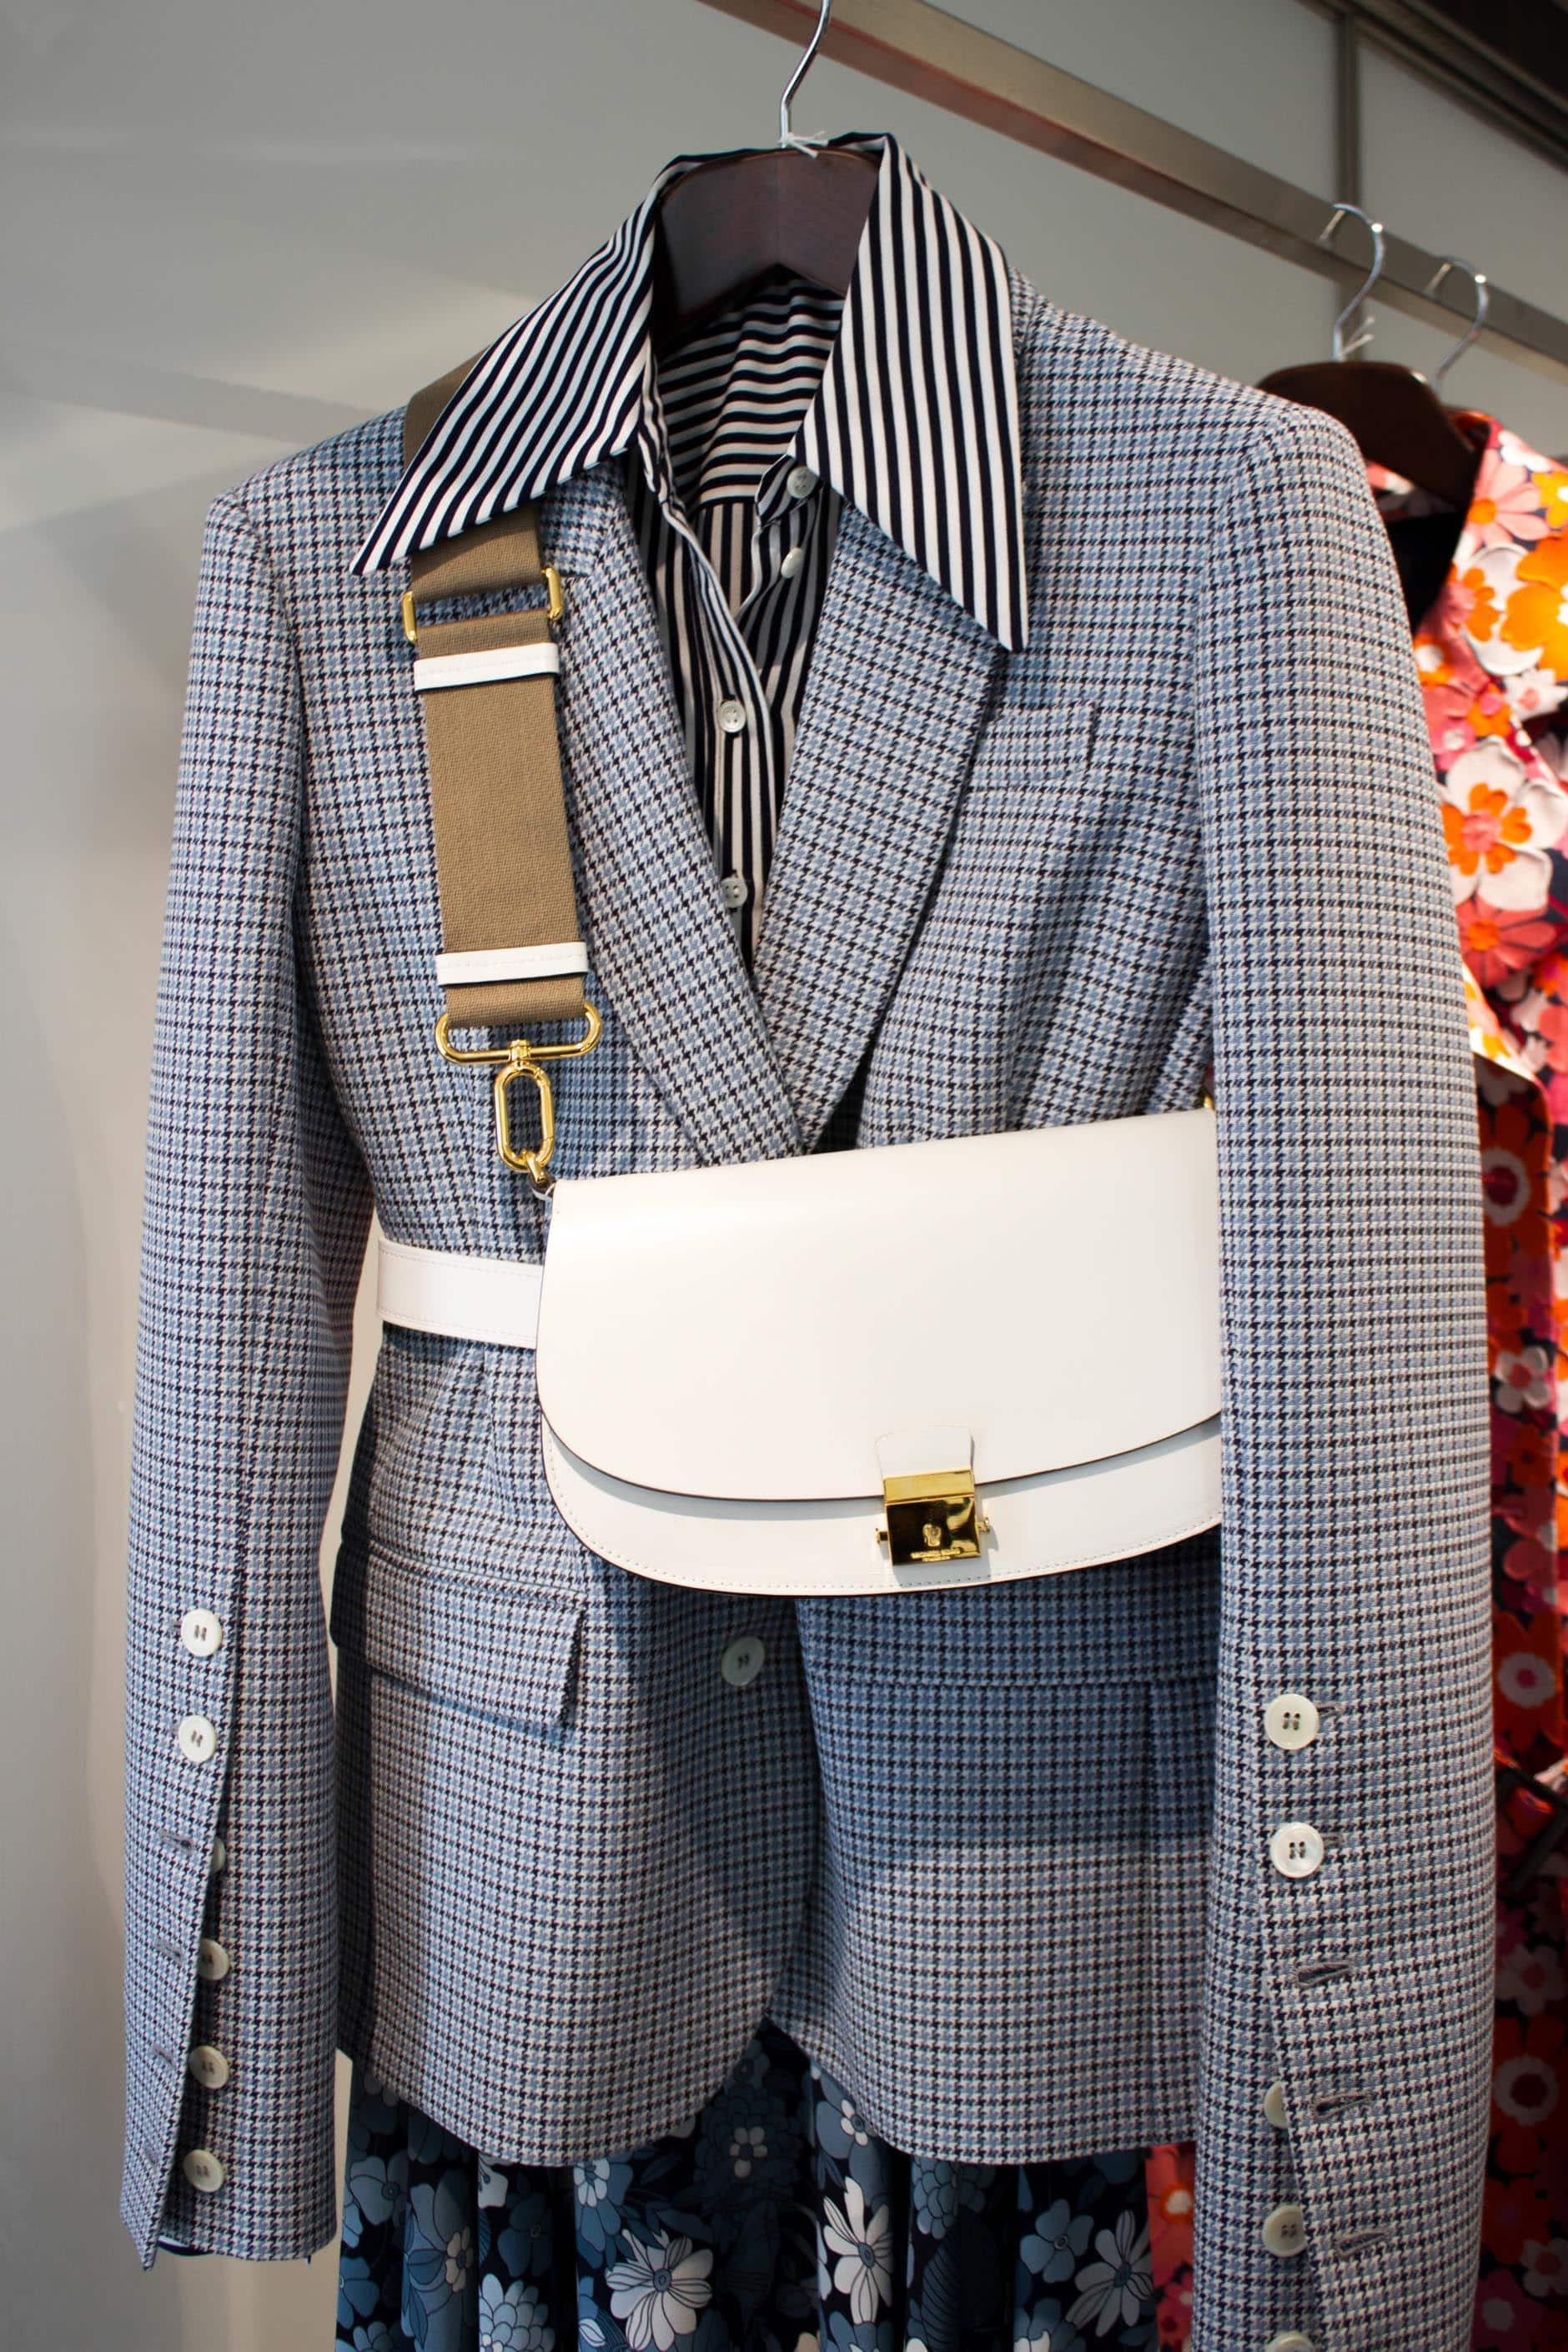 Structured suit